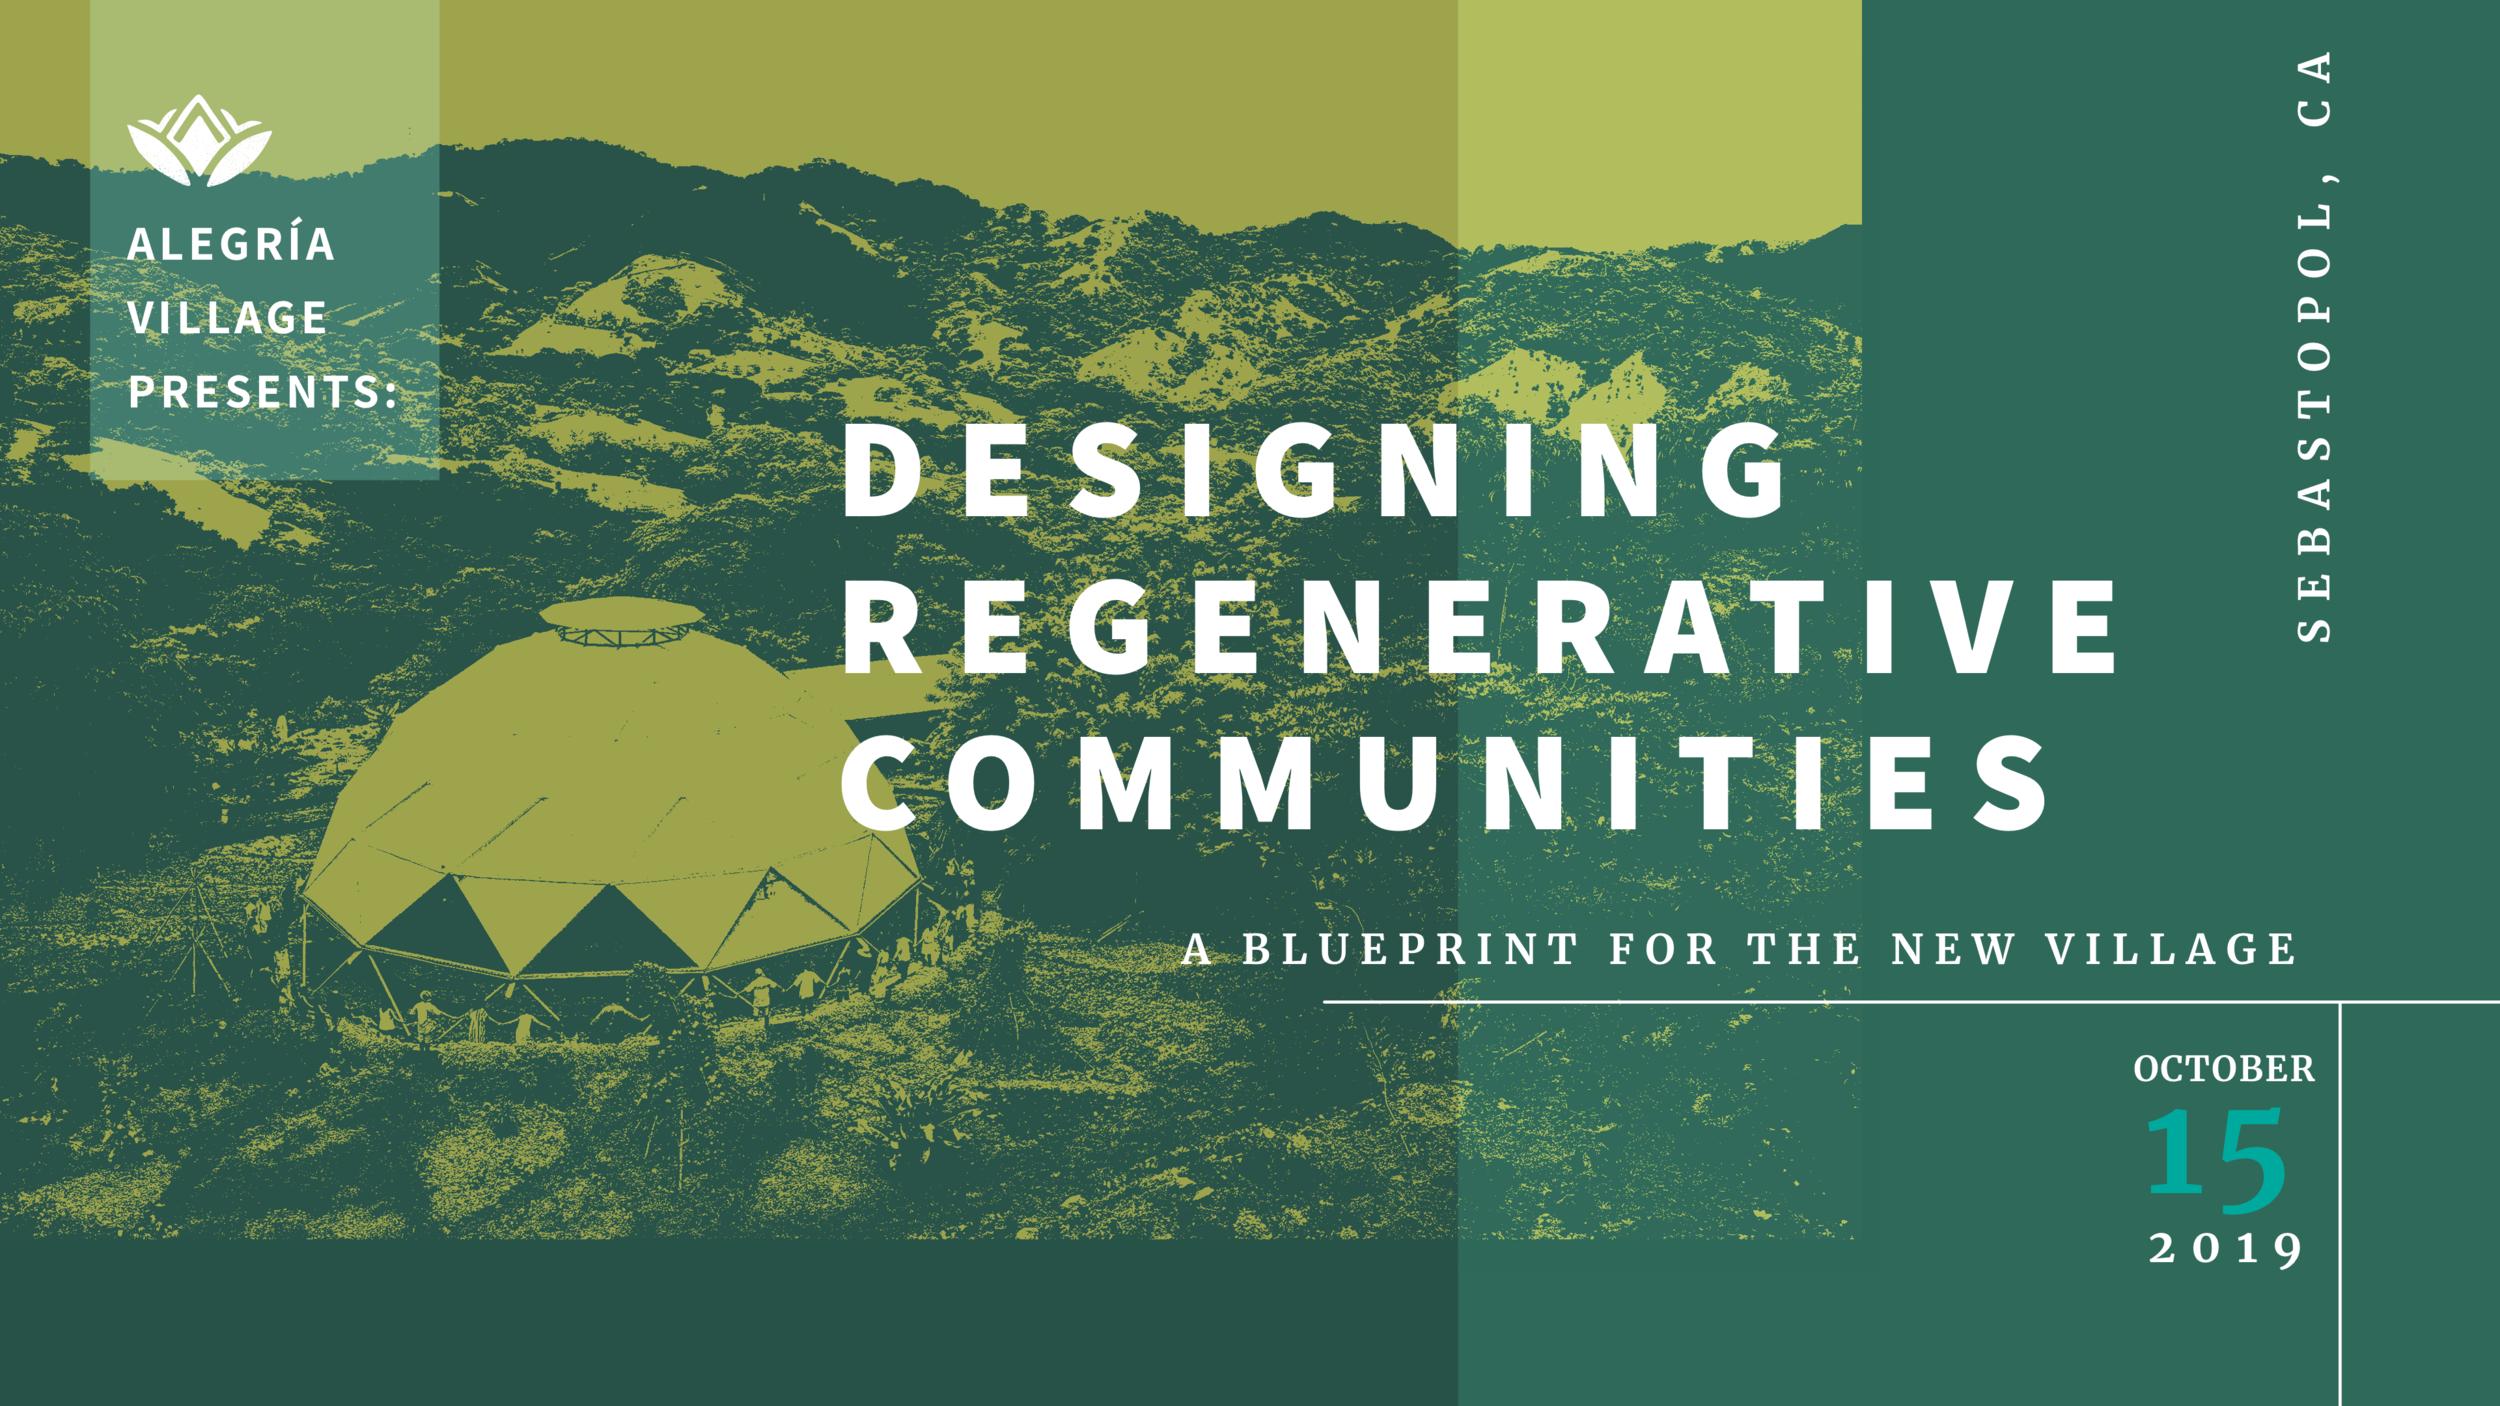 designing-regen-comm-sebastopol-facebook.png